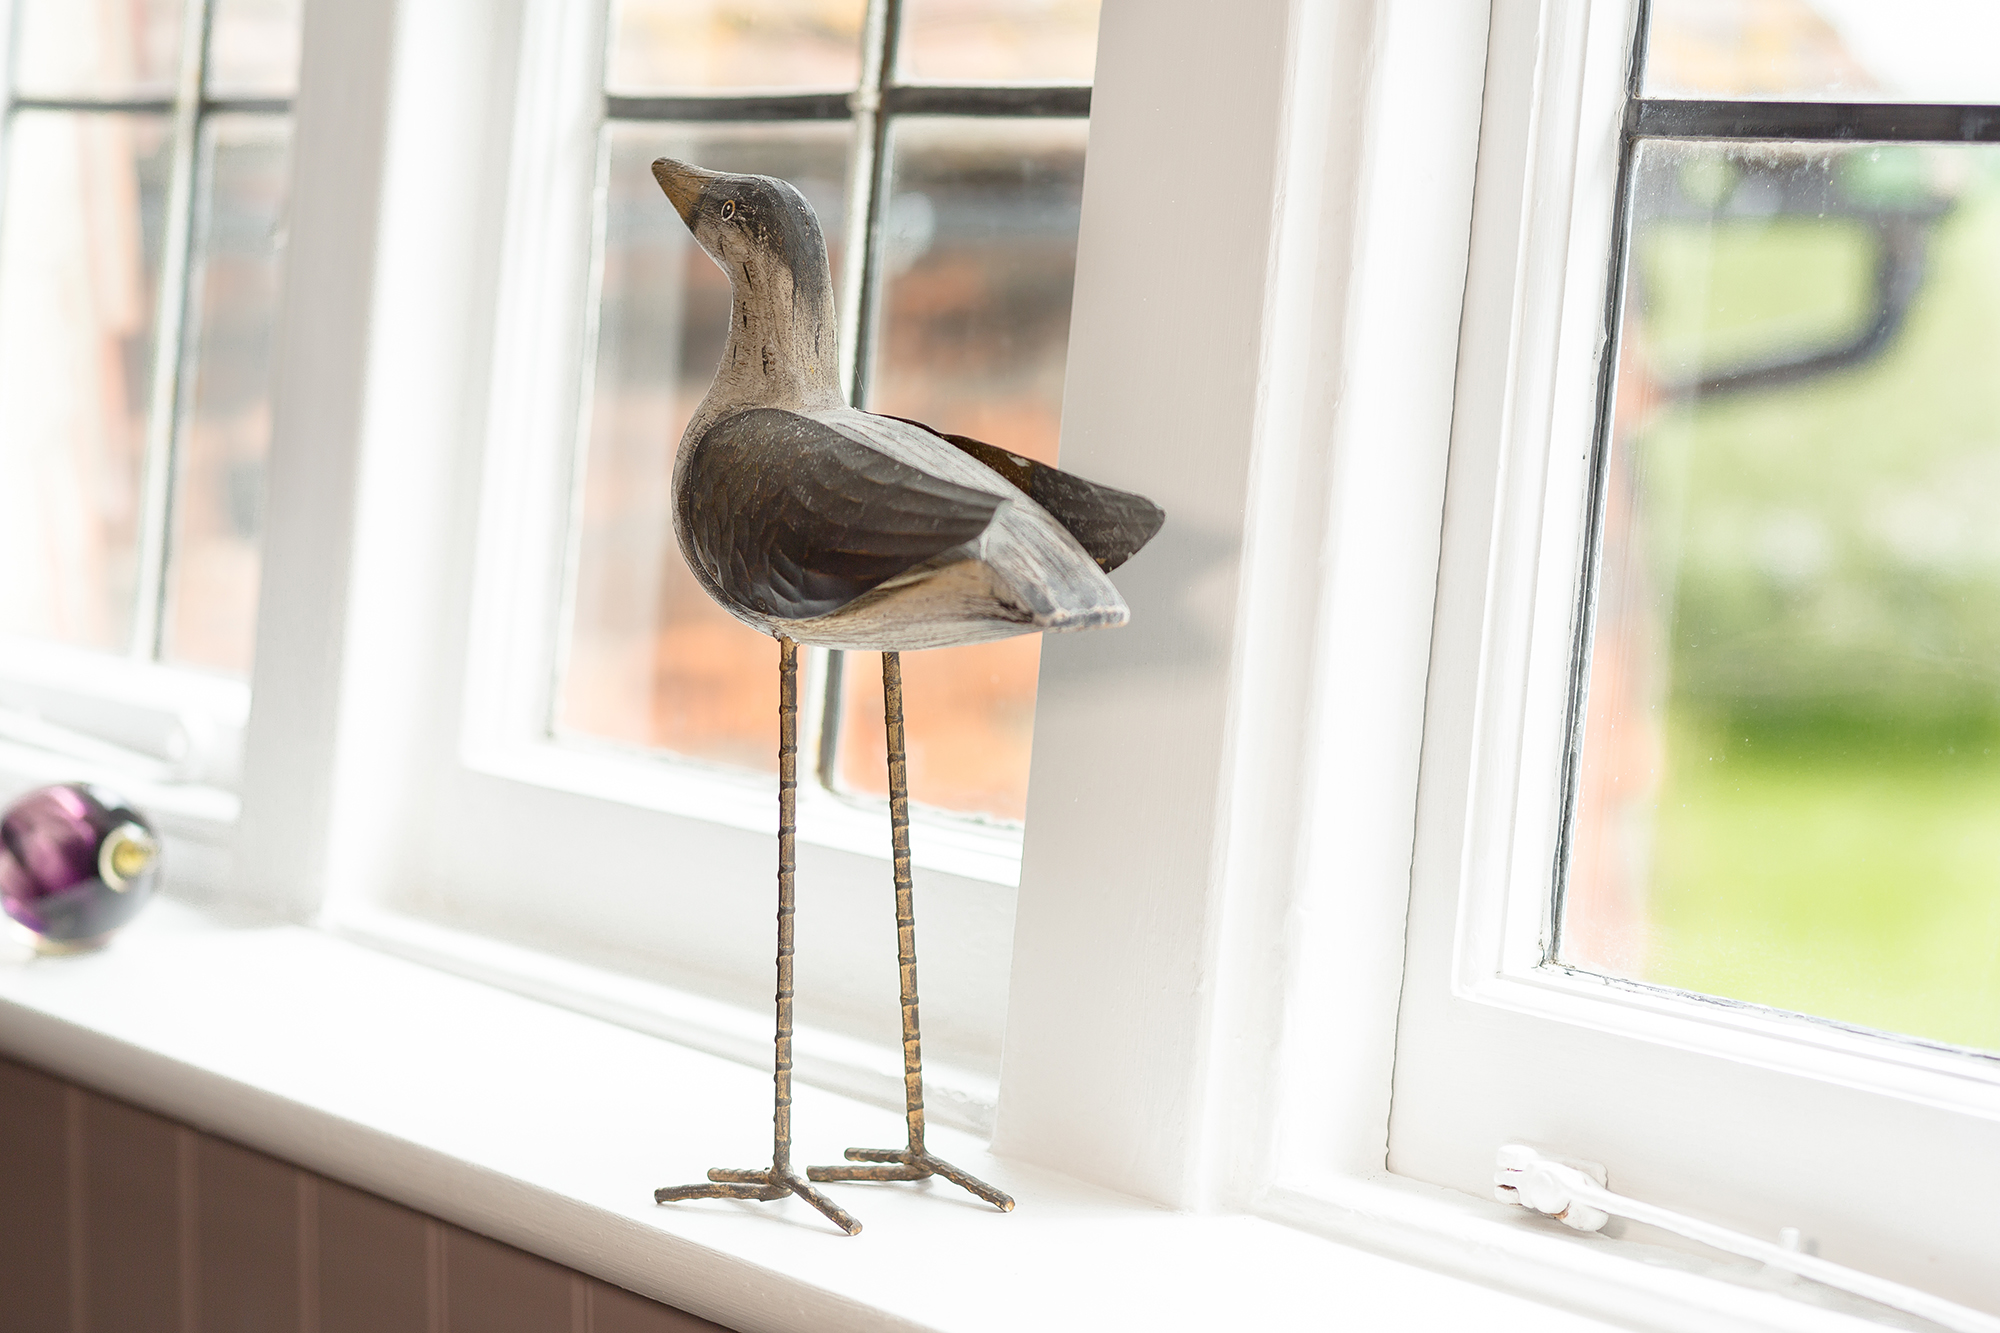 Wooden seagull